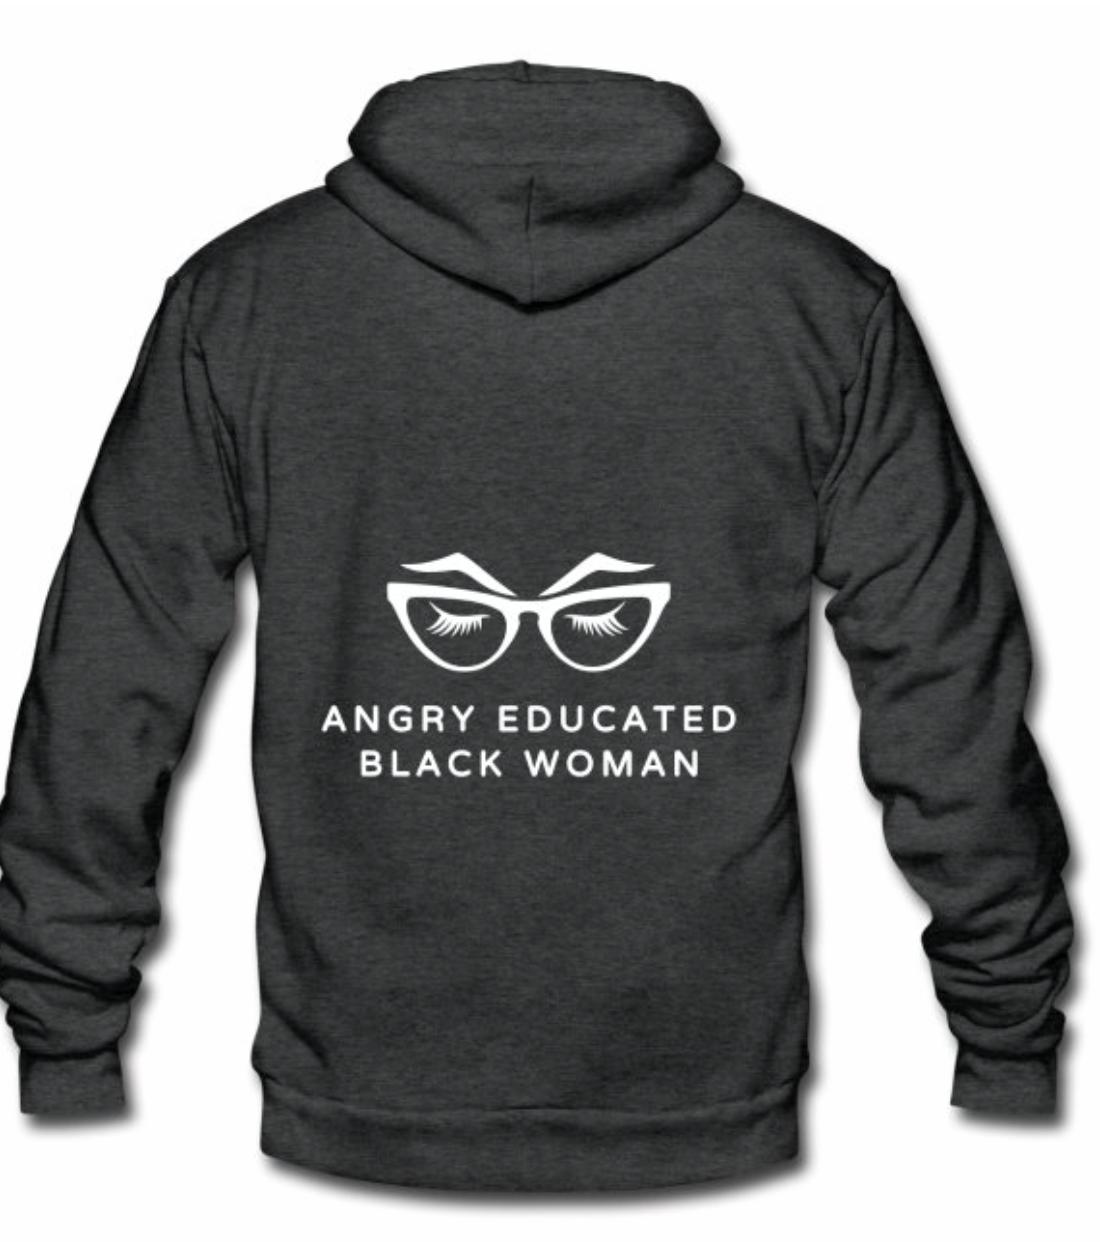 Angry Educated Black Woman Hoodie